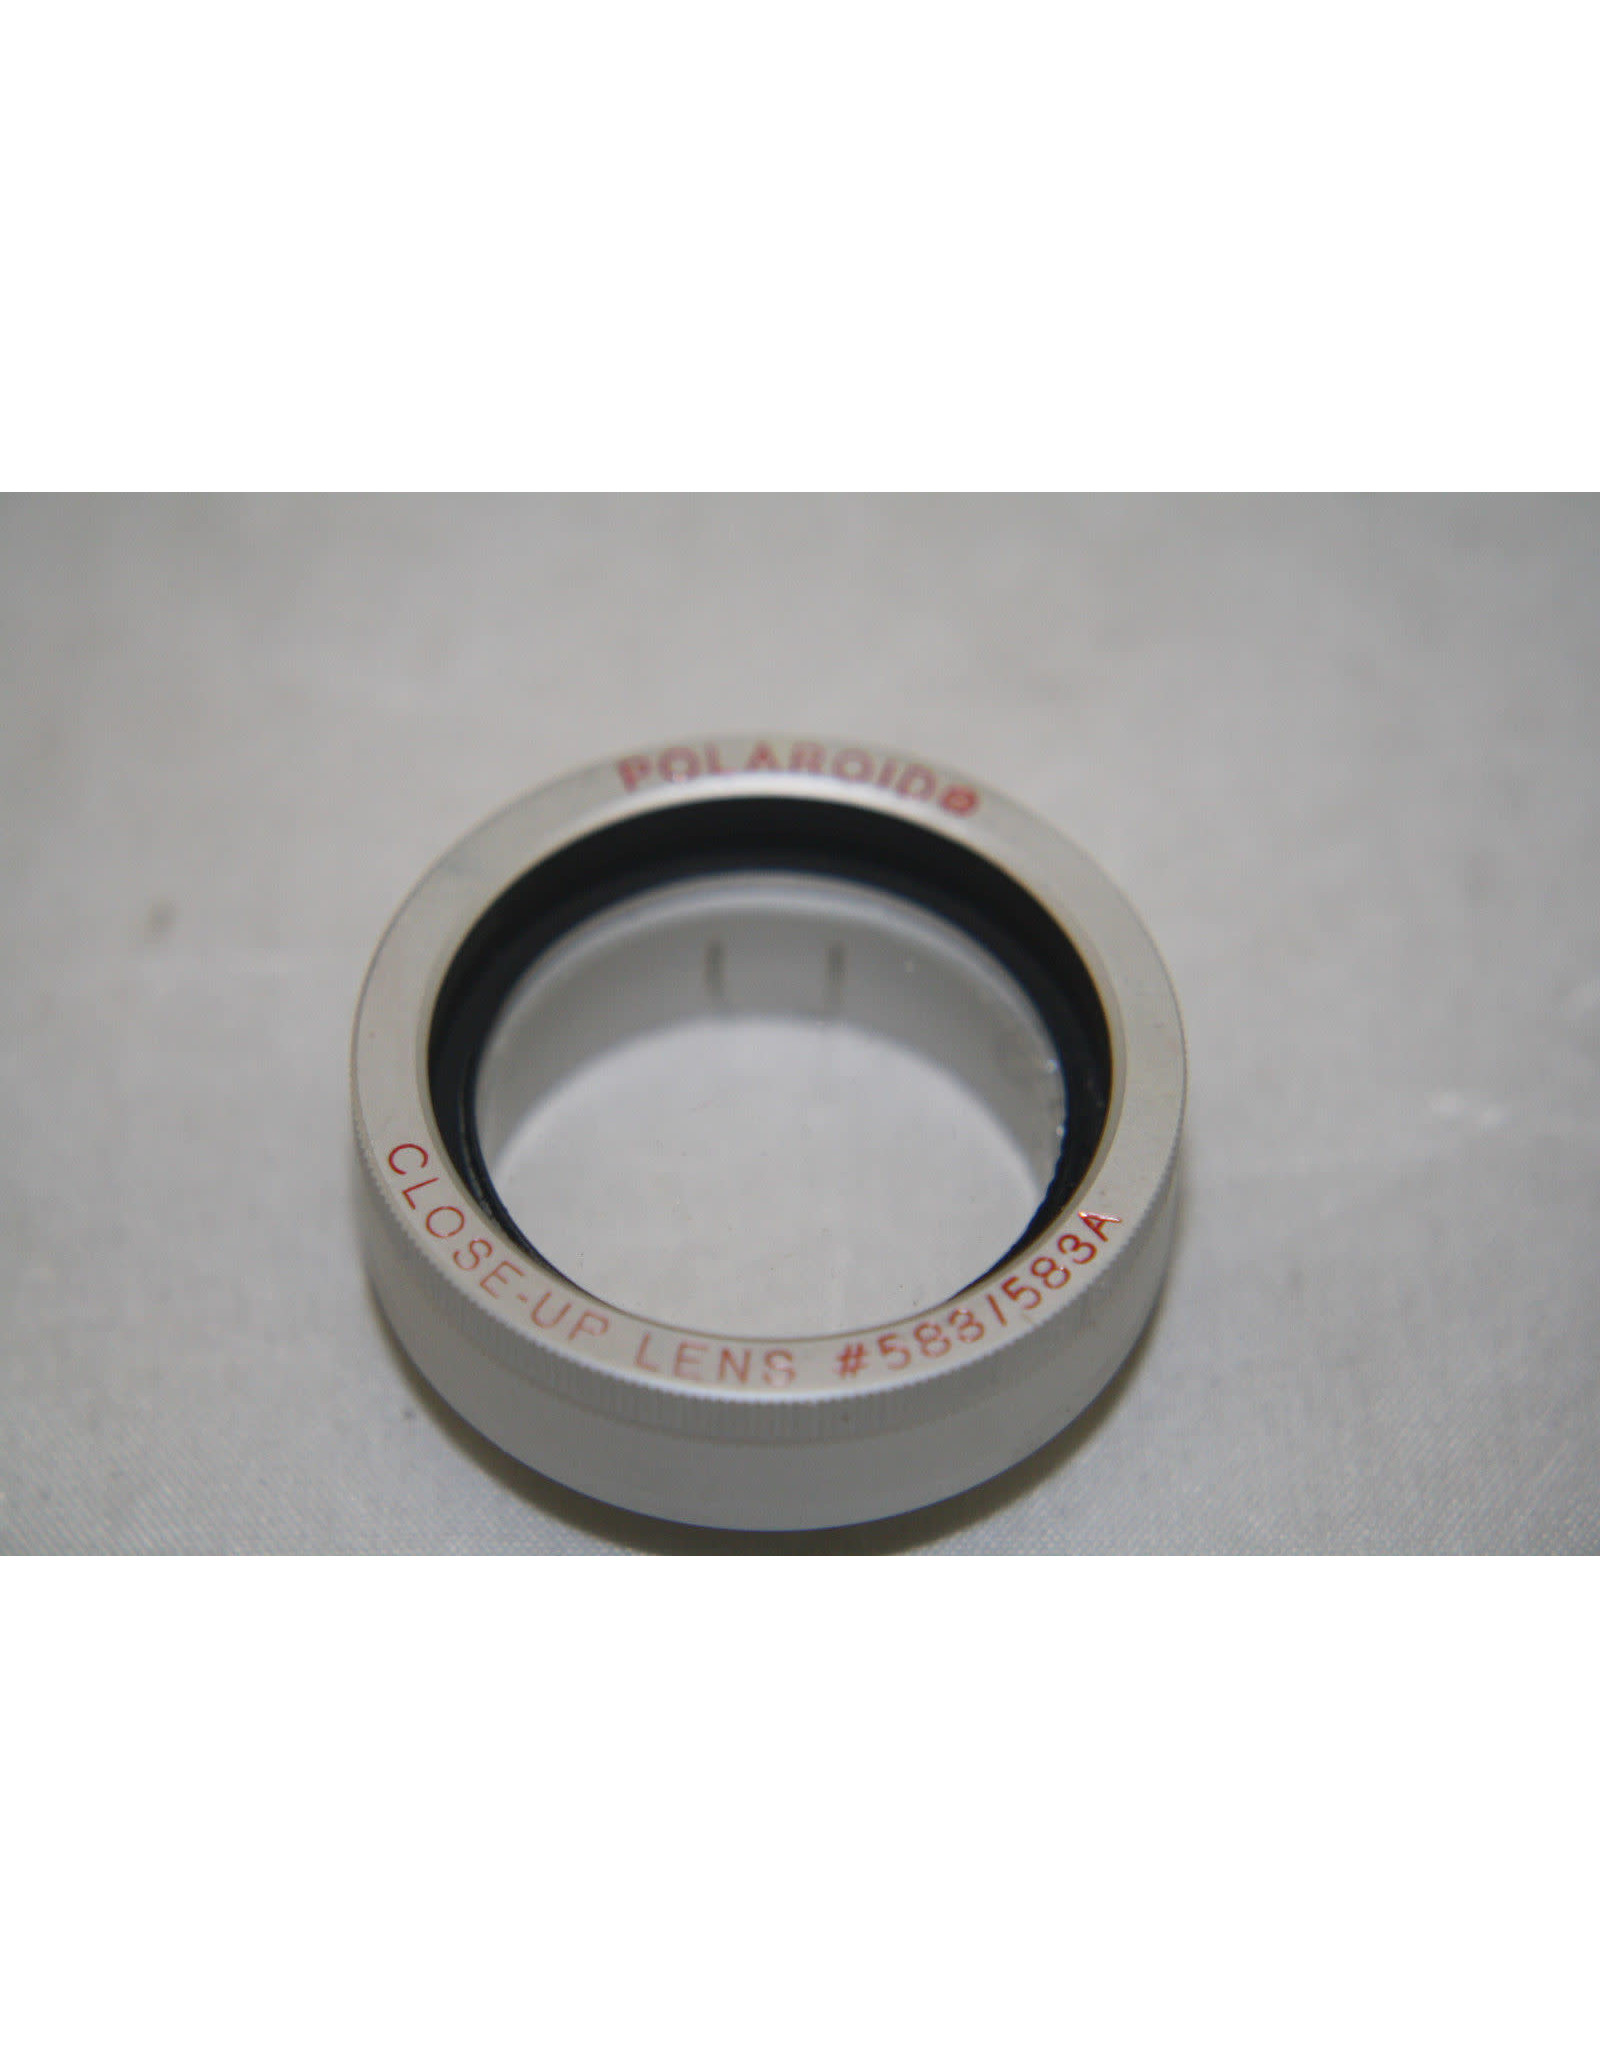 Polaroid Close-up kit #583 (Pre-owned)